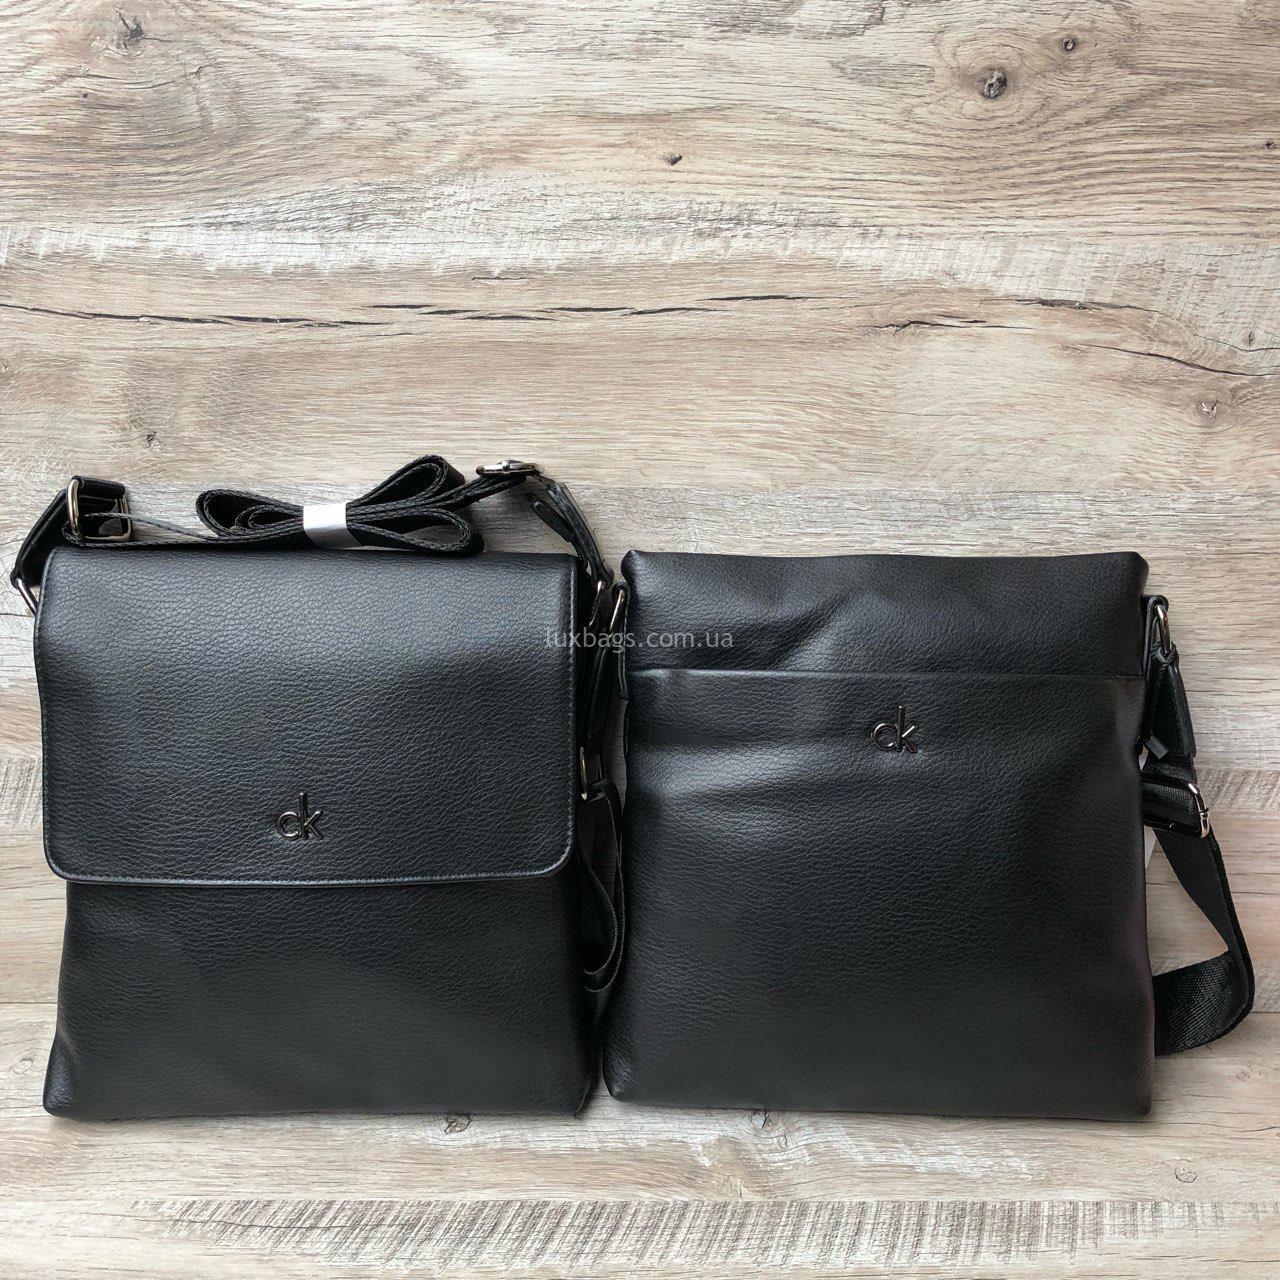 82758227 Мужская сумка Calvin Klein Купить на lux-bags Недорого